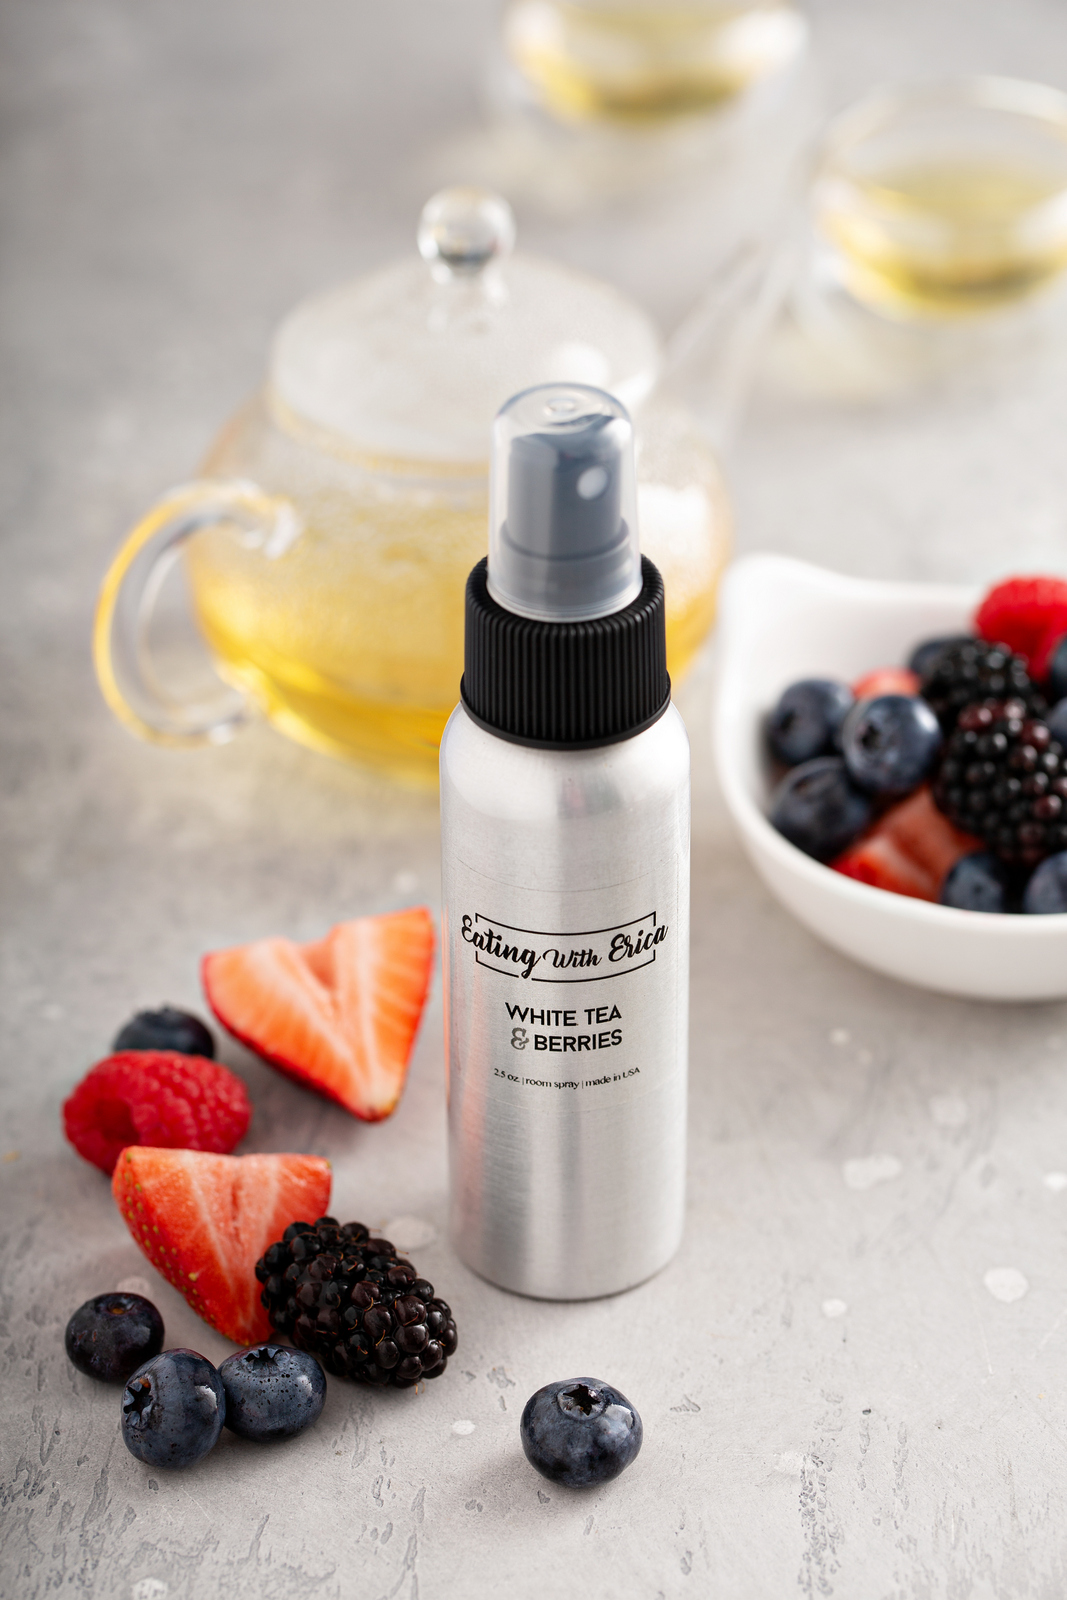 White Tea and Berries Room Spray